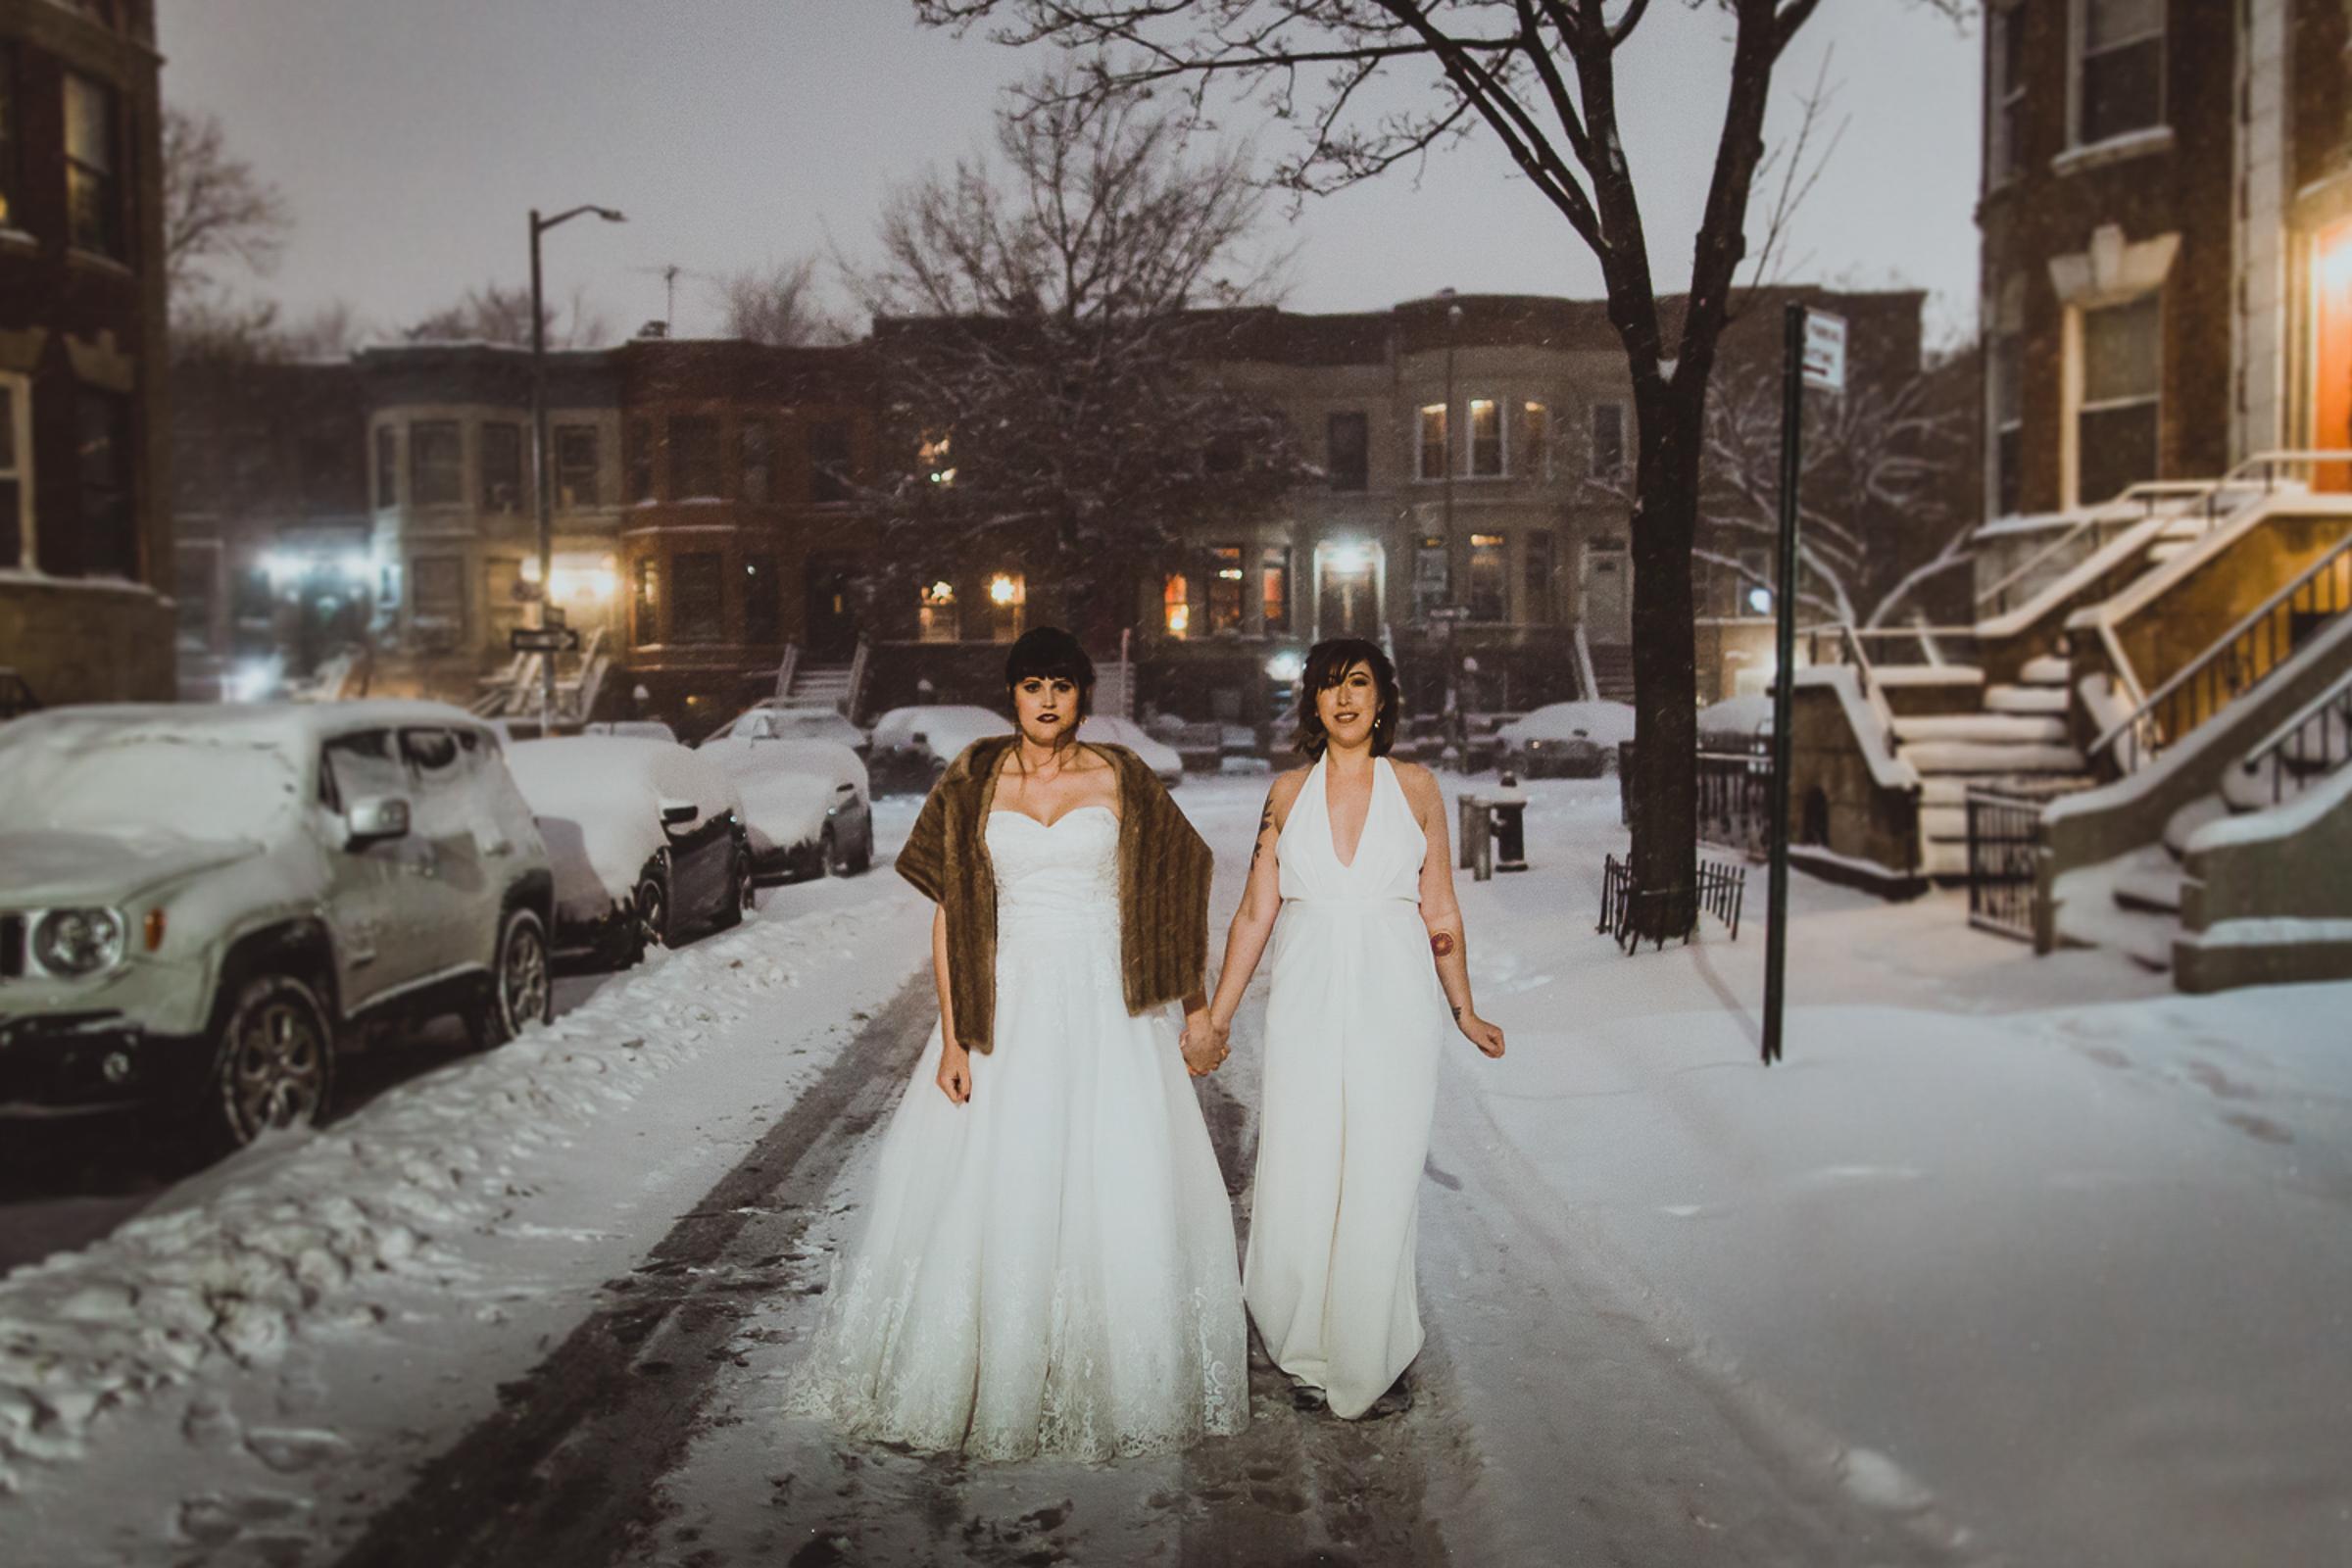 New-York-Documentary-Wedding-Photography-Best-Of-2017-by-Elvira-Kalviste-Photography-98.jpg